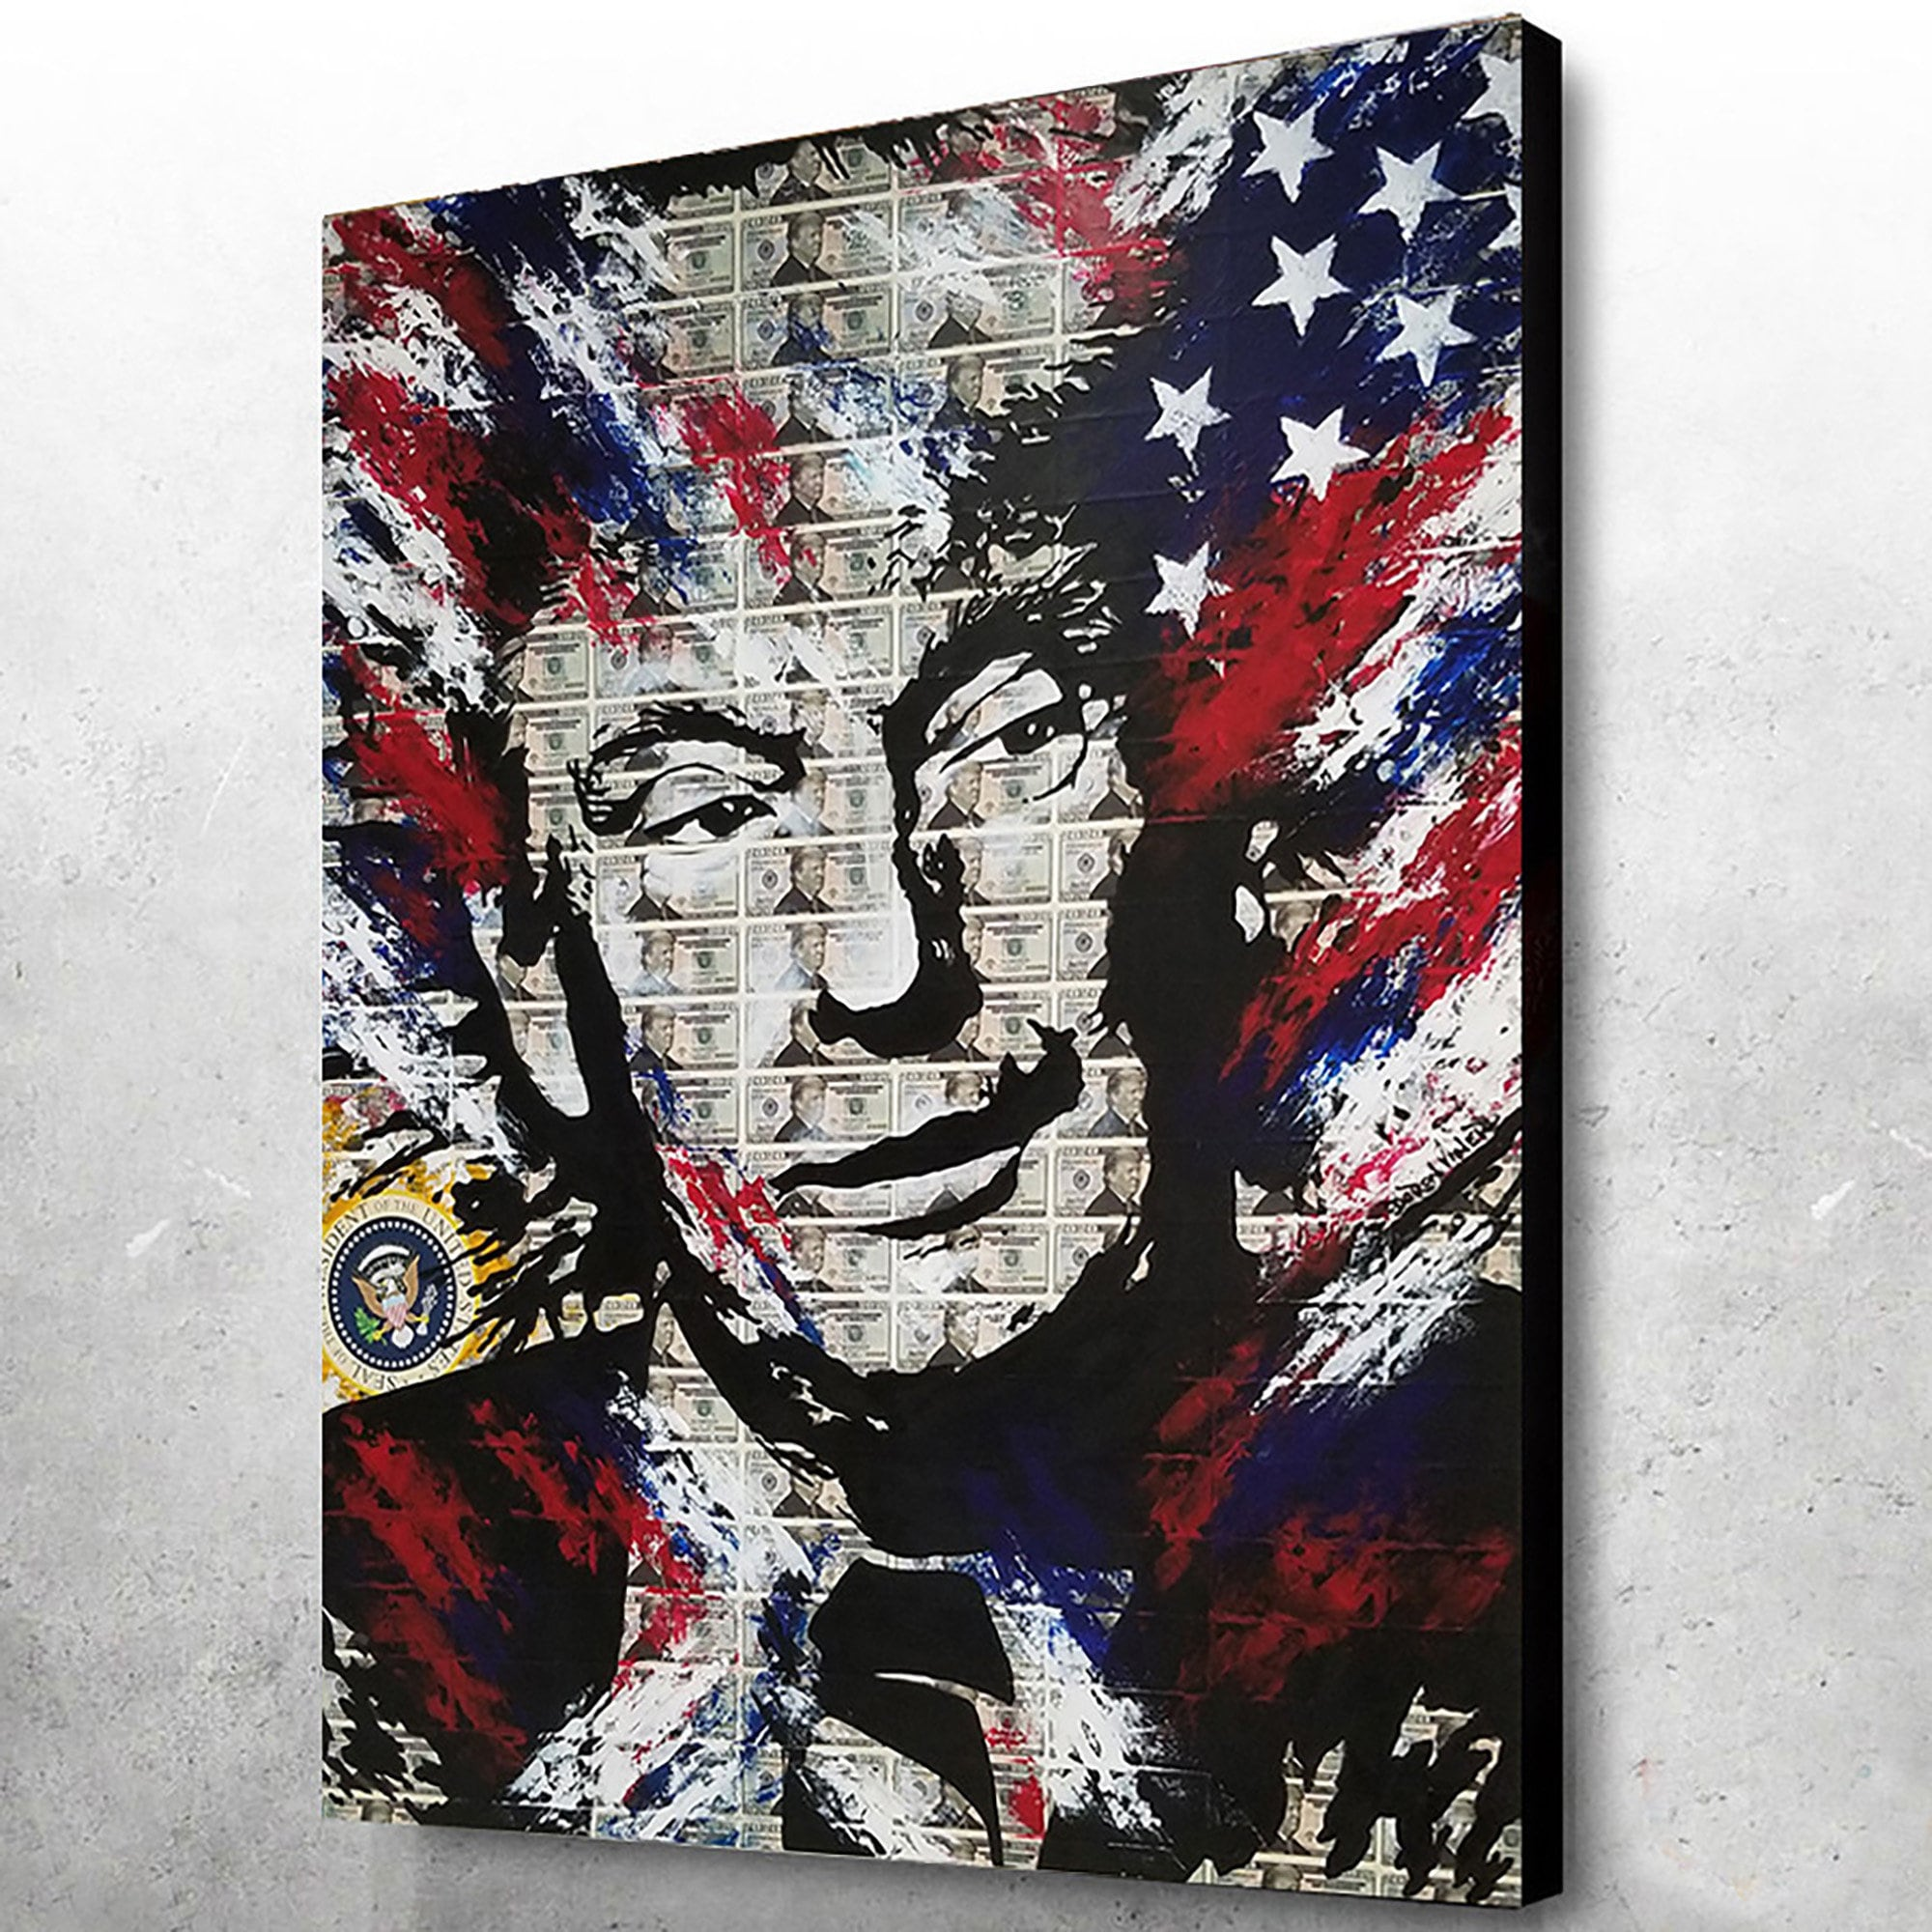 Andy Warhol Style Donald Trump Premium Canvas